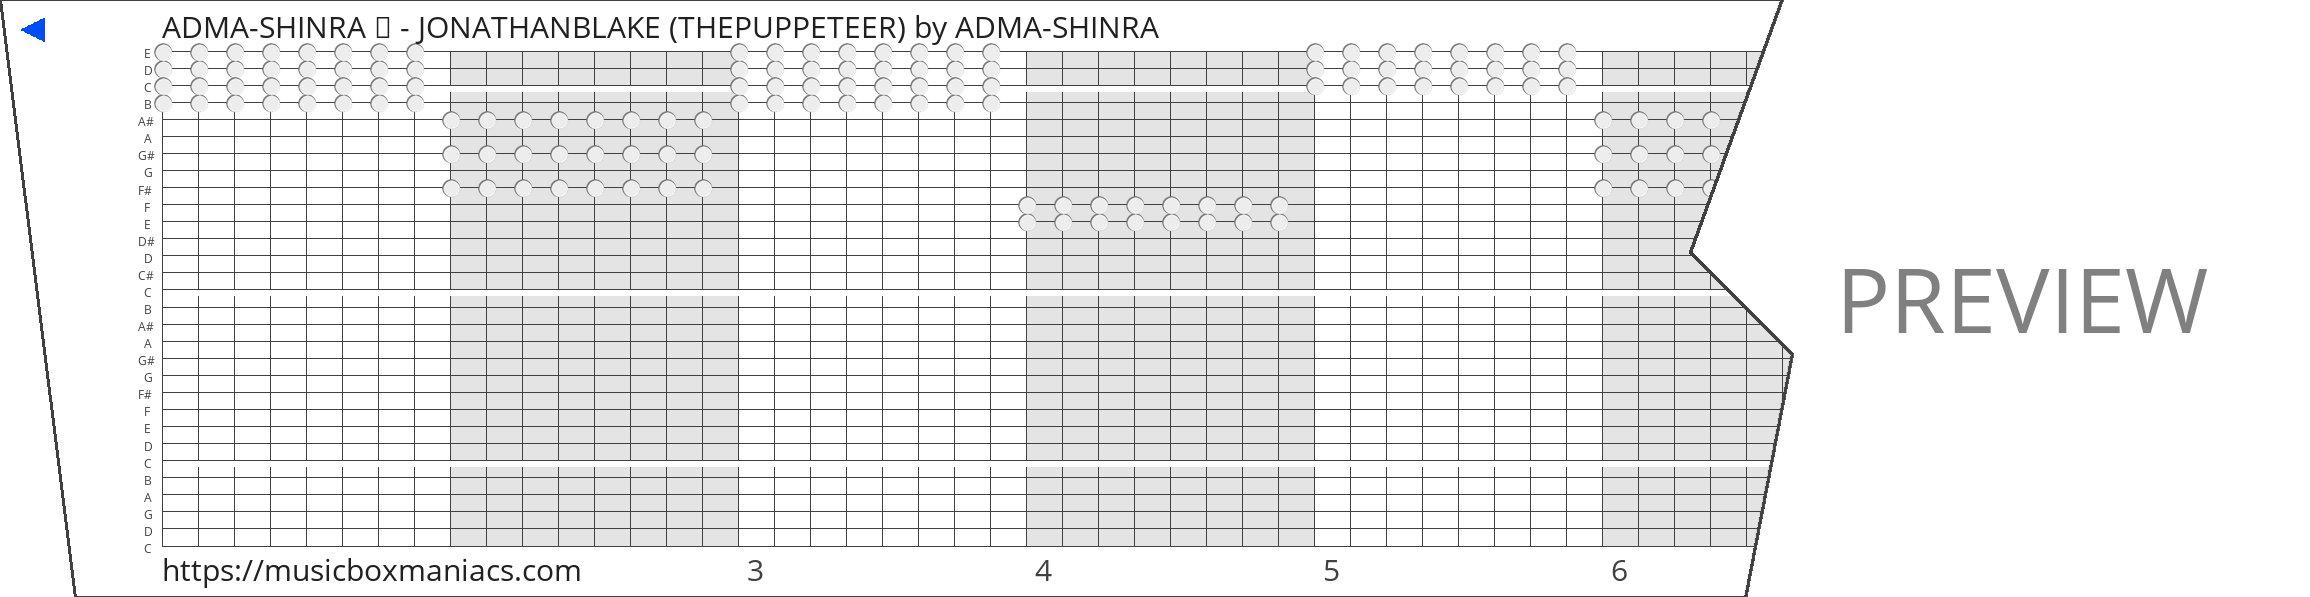 ADMA-SHINRA ♥ - JONATHANBLAKE (THEPUPPETEER) 30 note music box paper strip